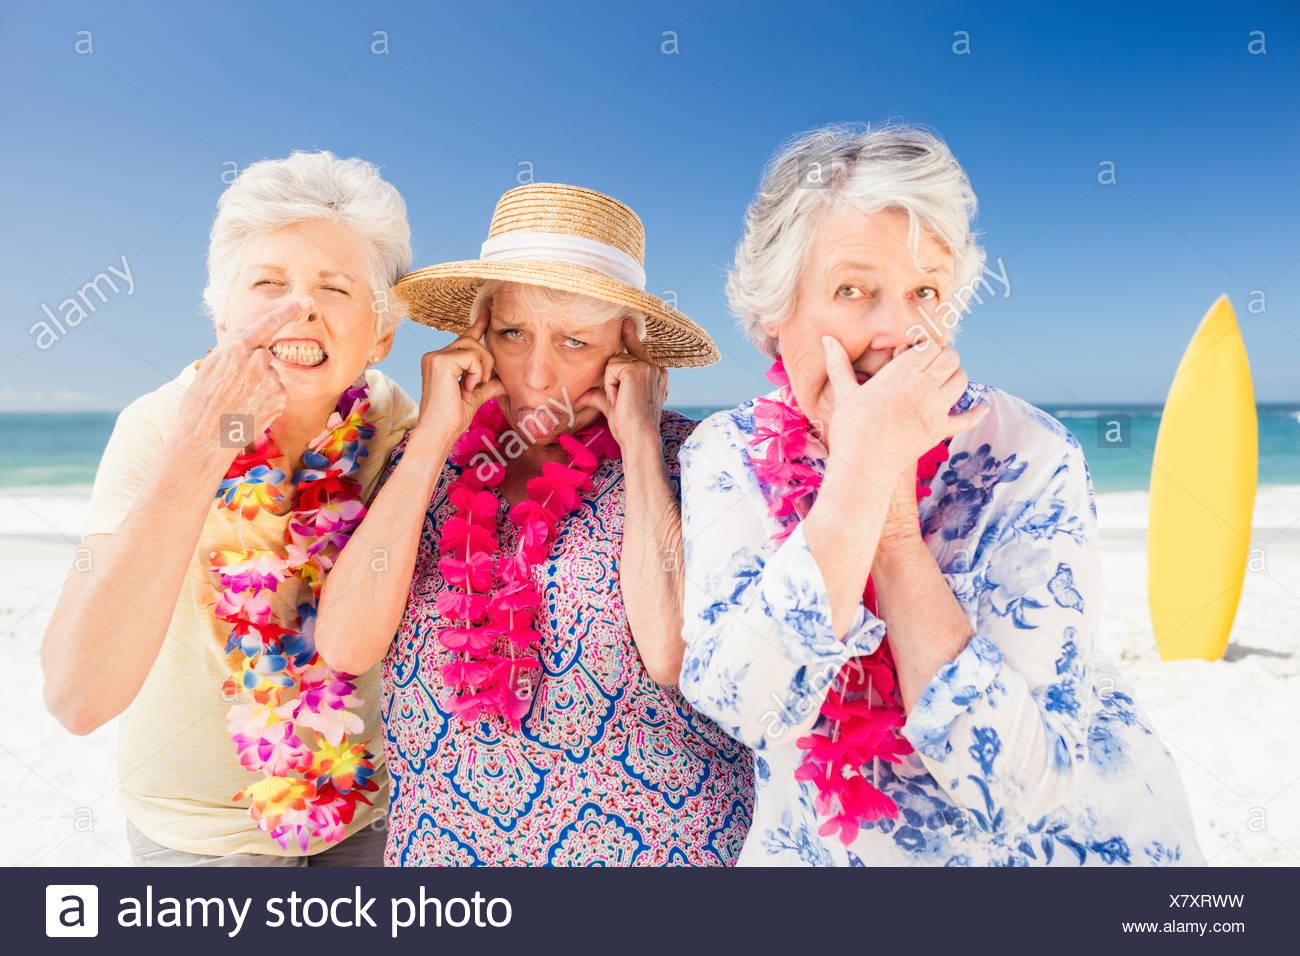 Mujer mayor haciendo mueca Imagen De Stock